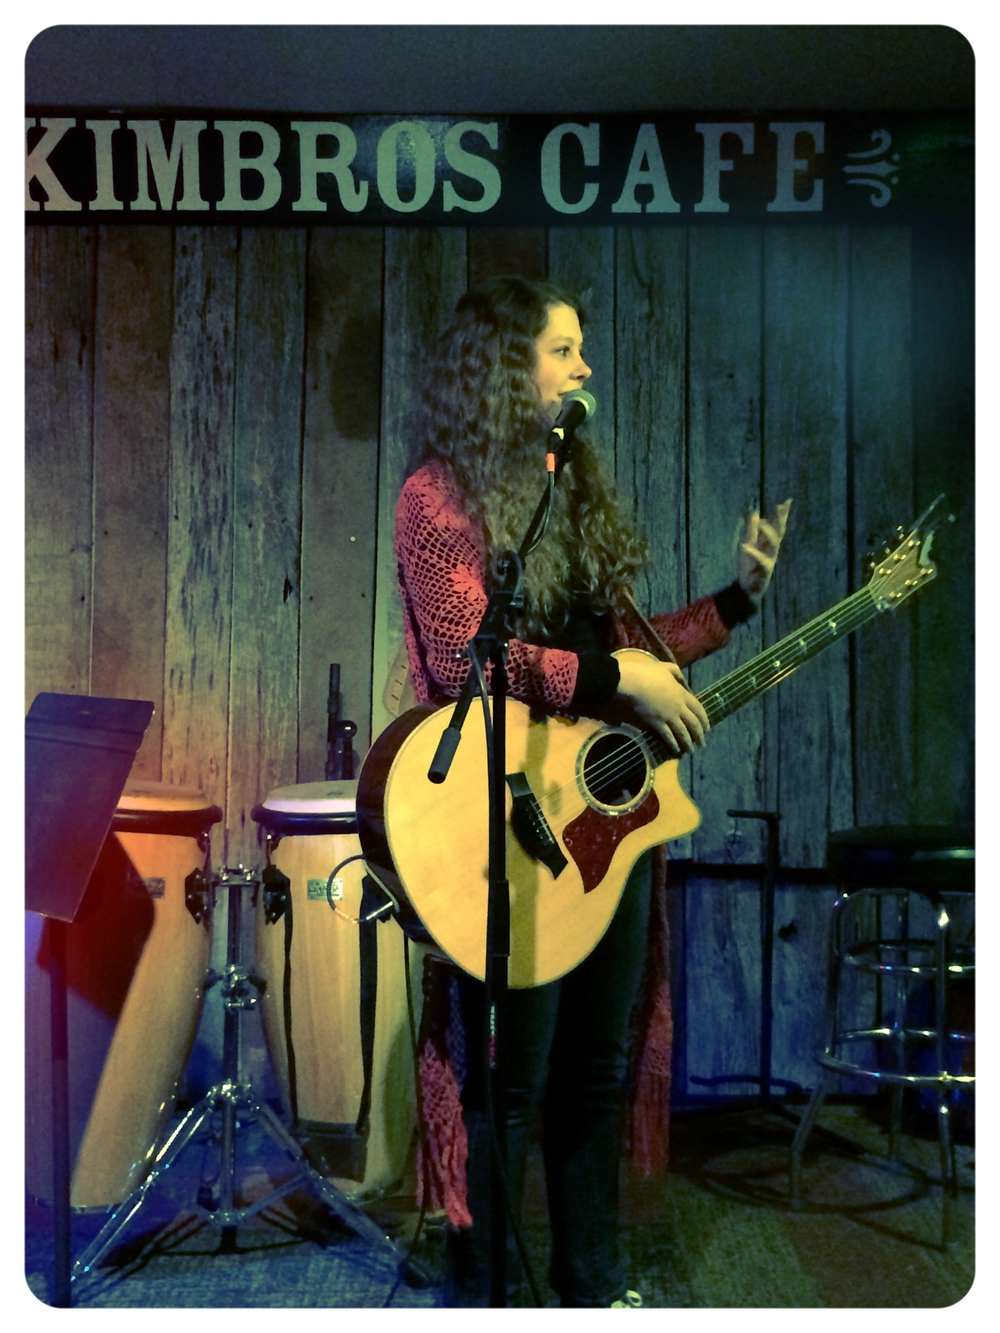 Second night at Kimbro's